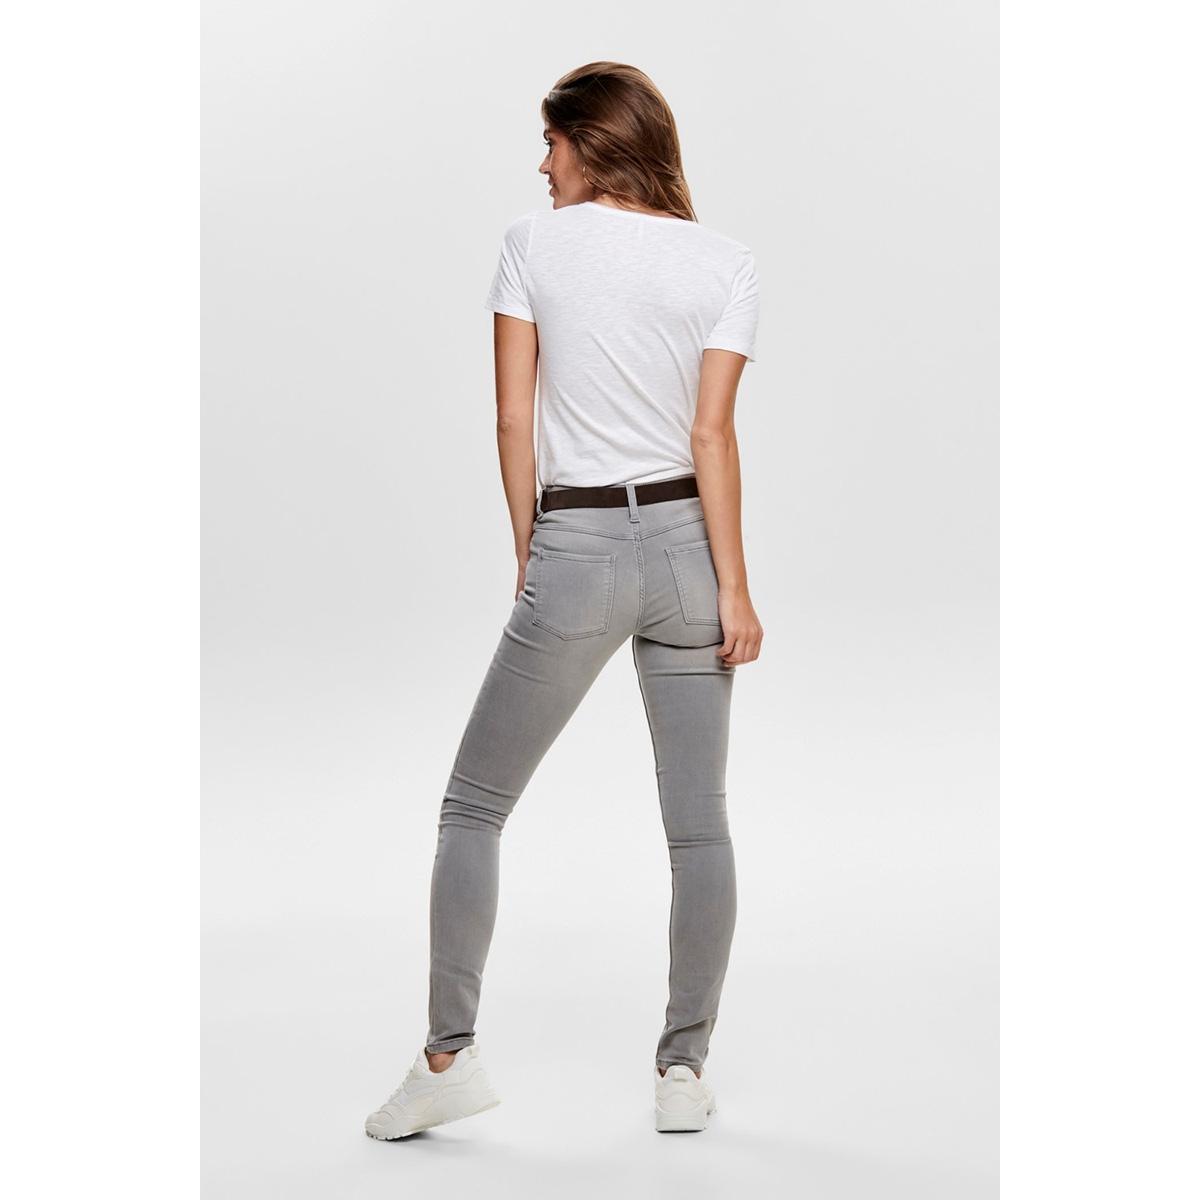 jdyjake life skinny rw grey dnm noo 15161189 jacqueline de yong jeans grey denim